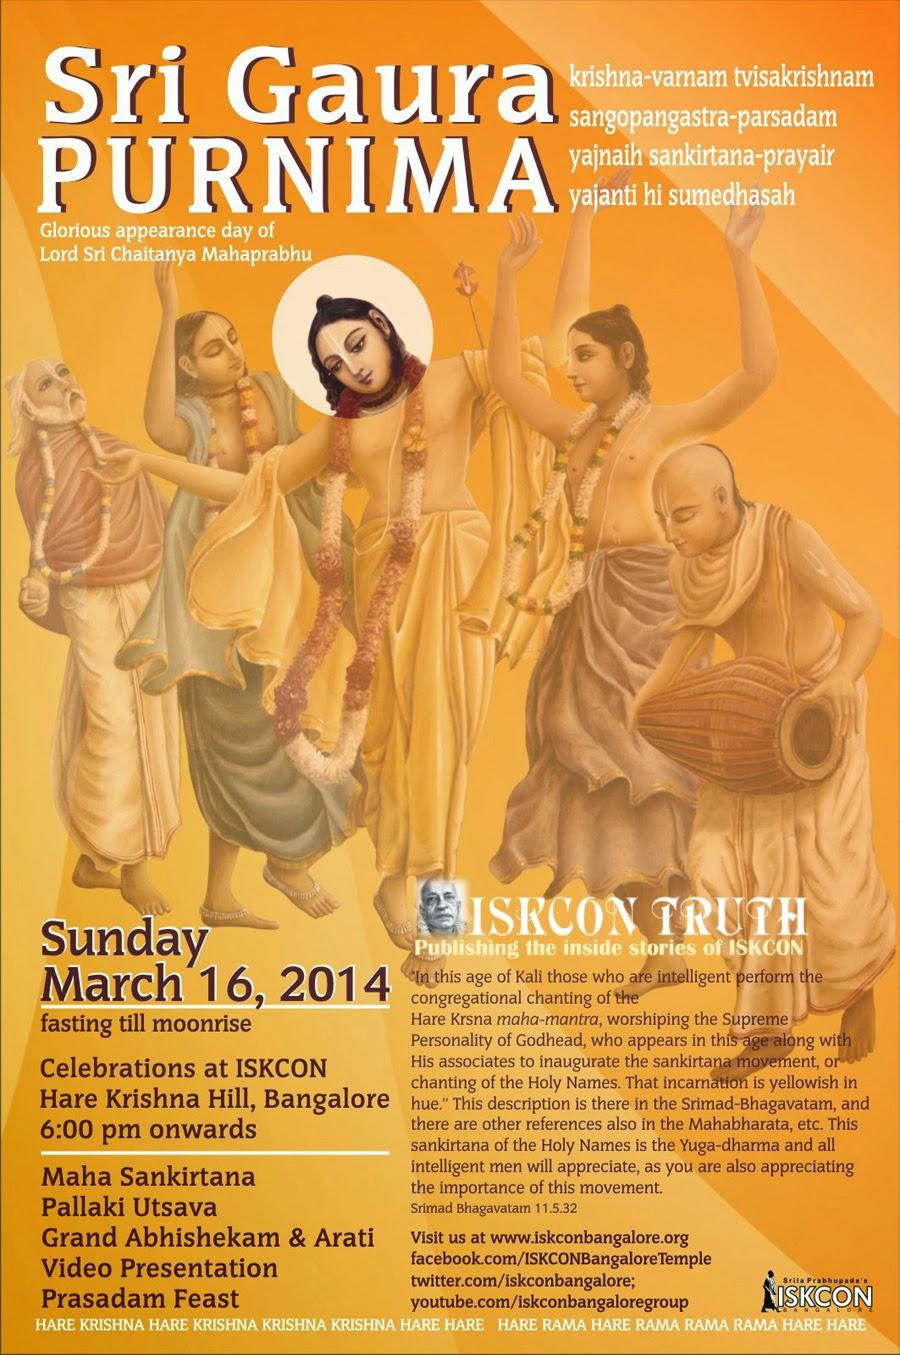 Gaura Purnima, iskcon bangalore, events, hare krishna temple